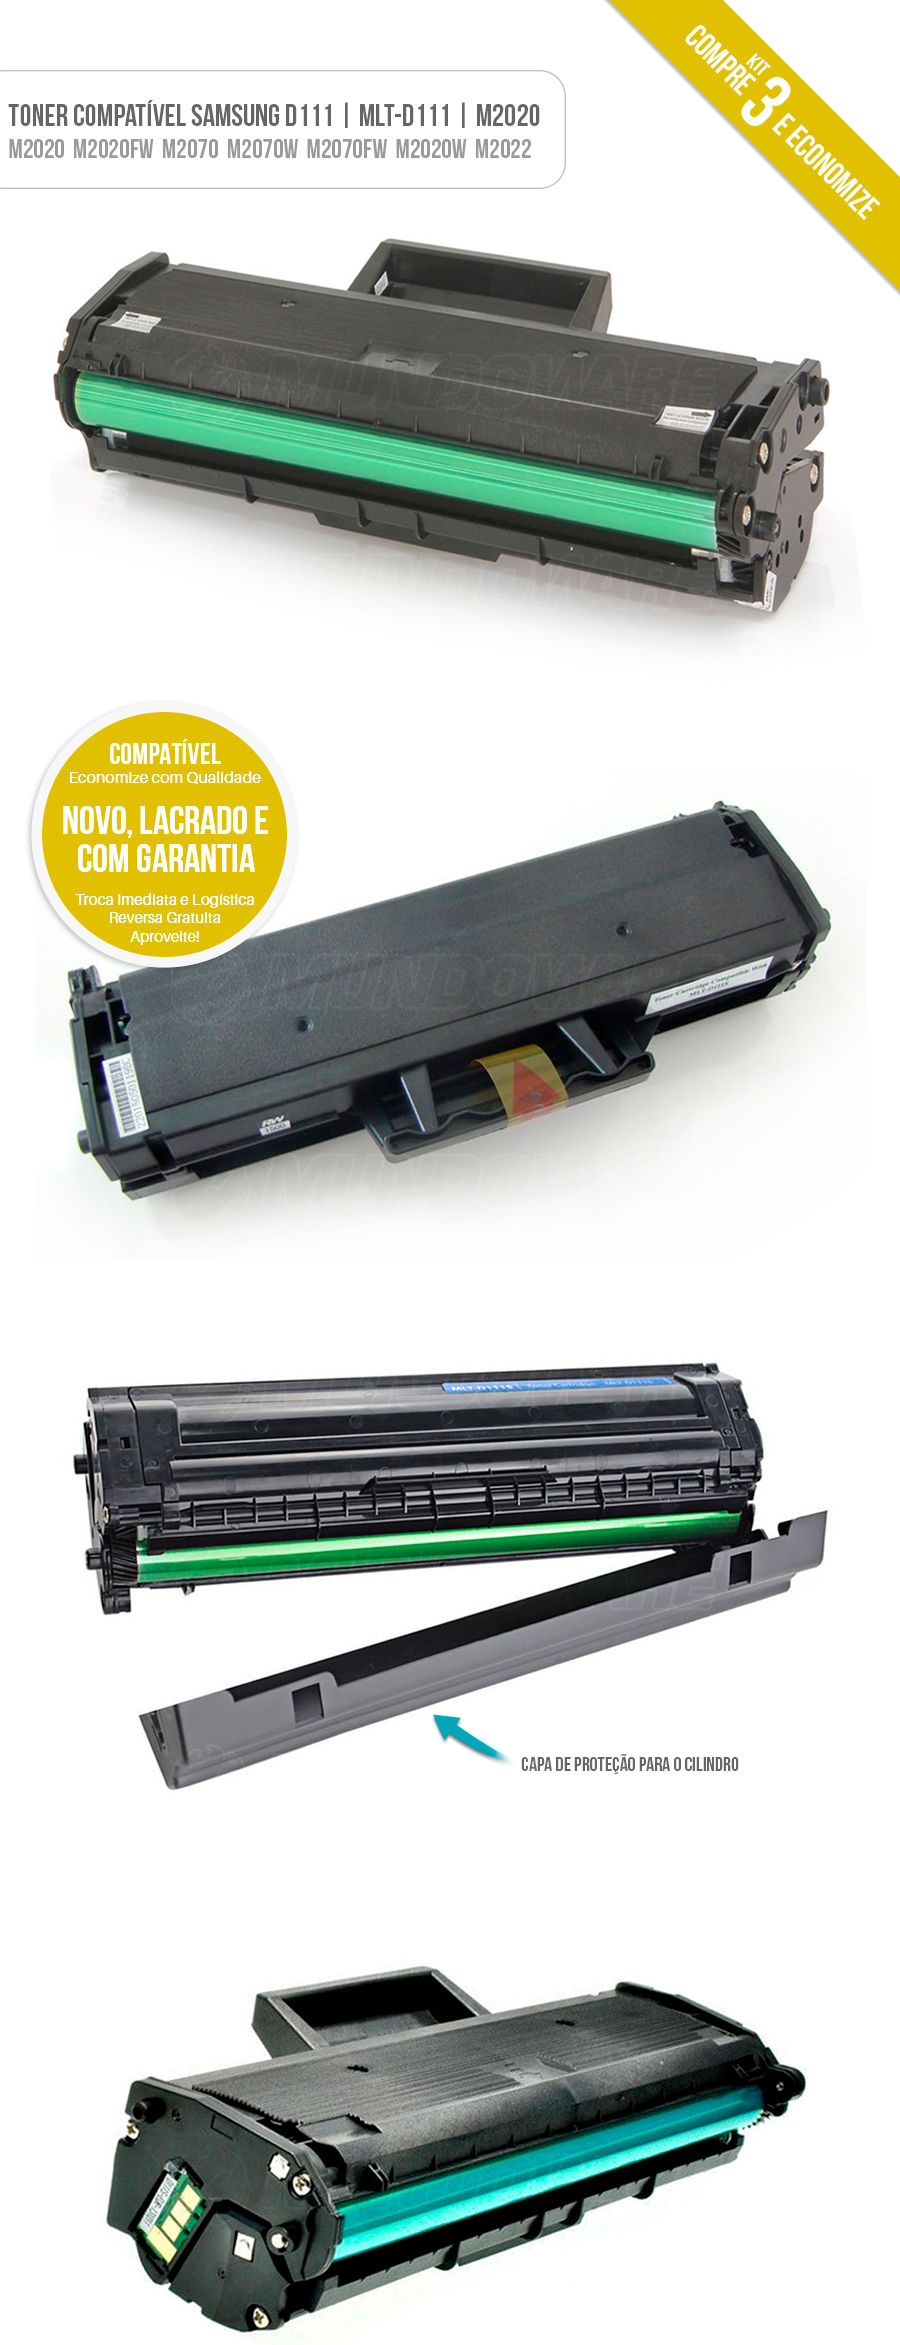 Kit 3 Toner para impressora Xpress M2020 M2020W M2020FW M2022 M2070 M2070W M2070FW Tonner